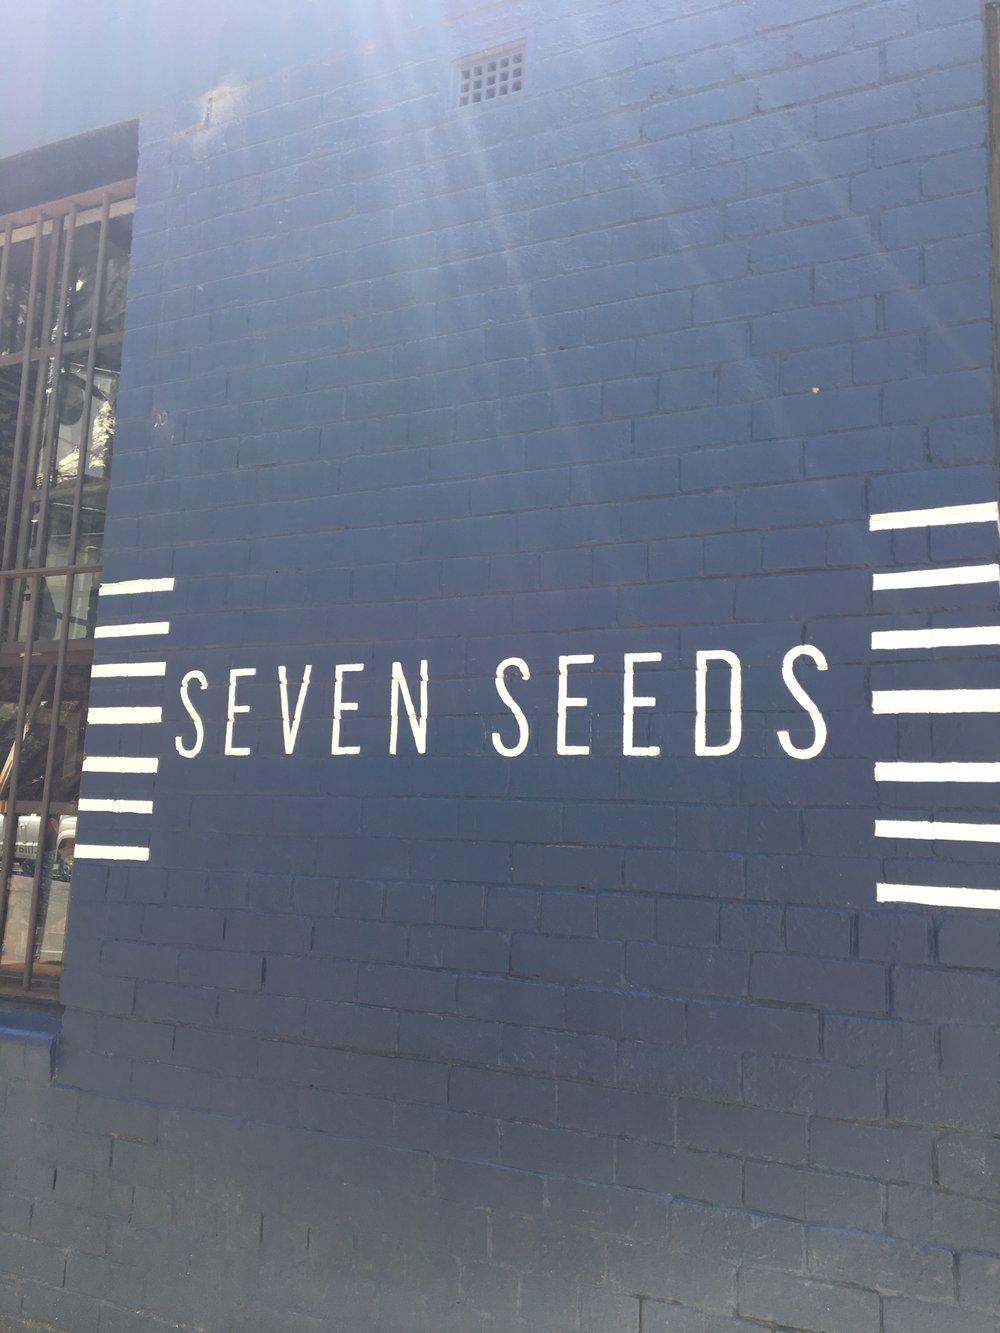 australia-melbourne-city-seven-seeds.JPG